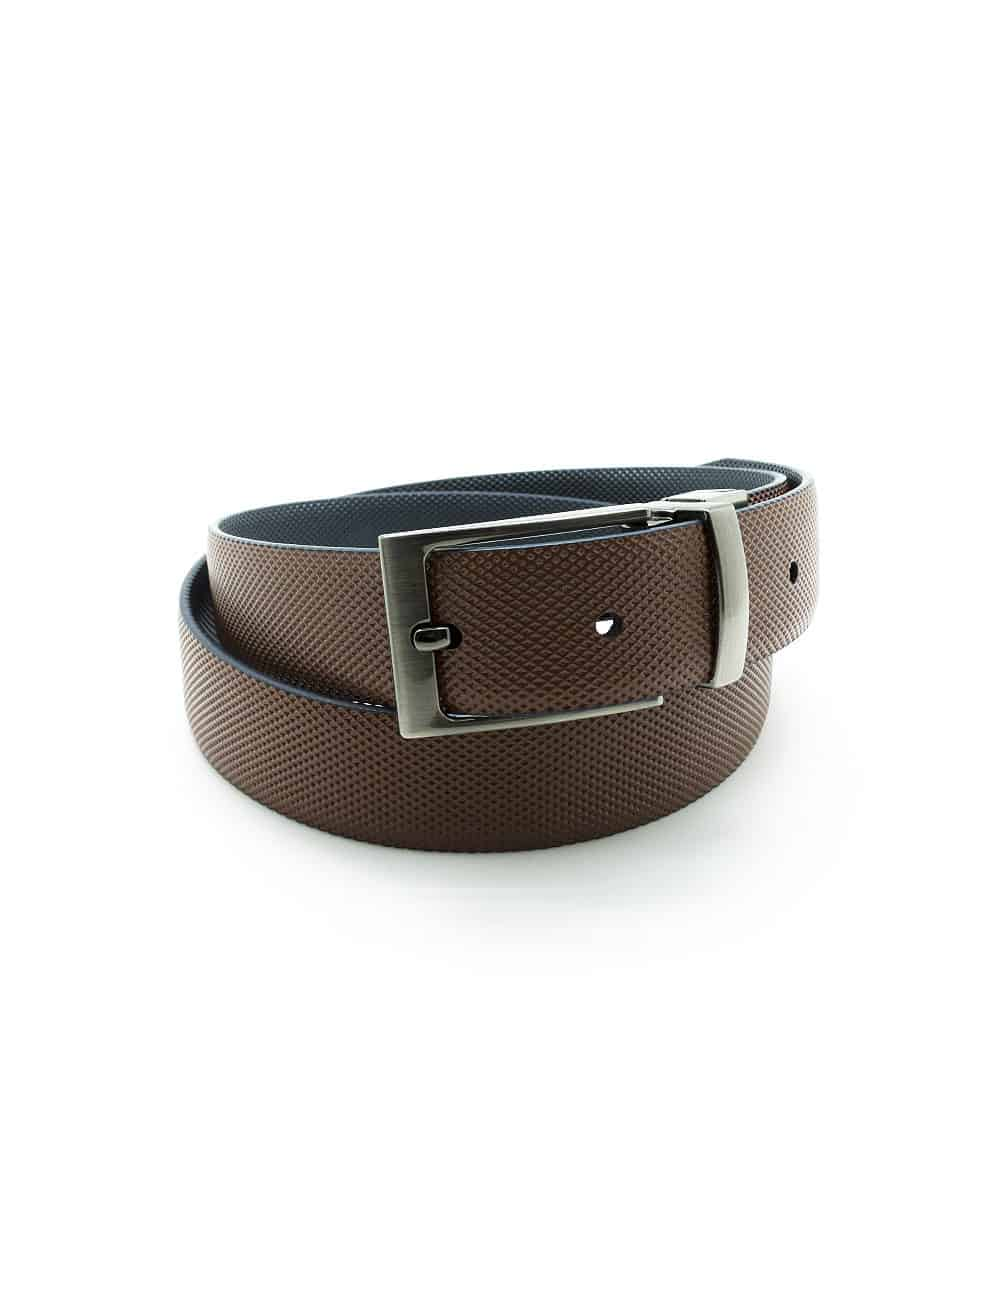 Navy / Brown Textured Reversible Leather Belt LBR4.8